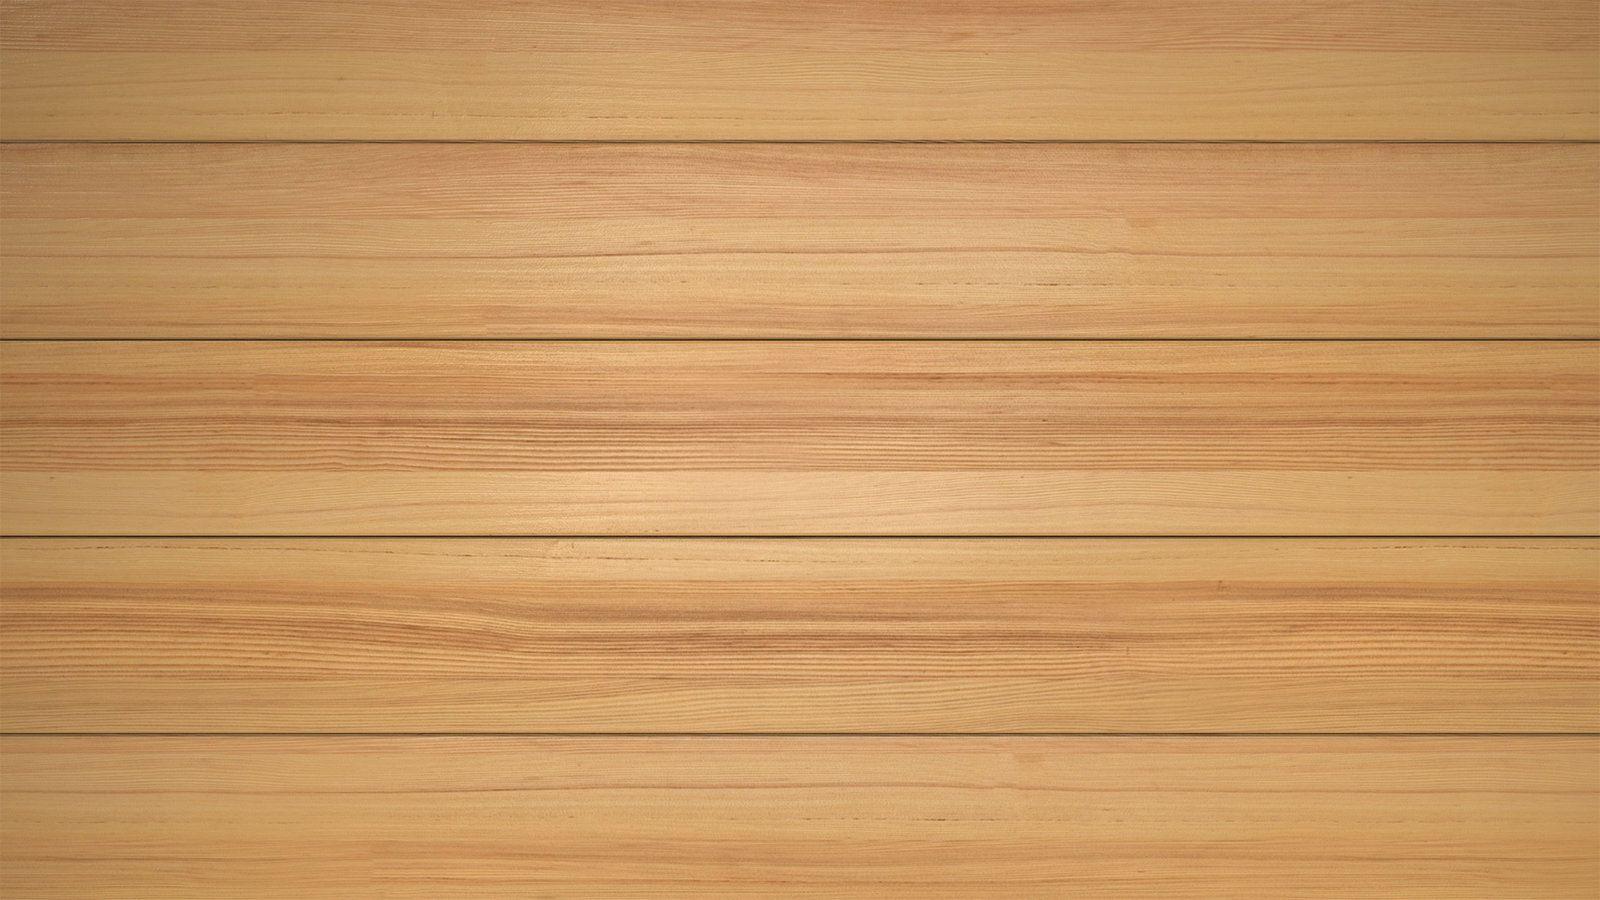 wood lap siding texture seamless google search